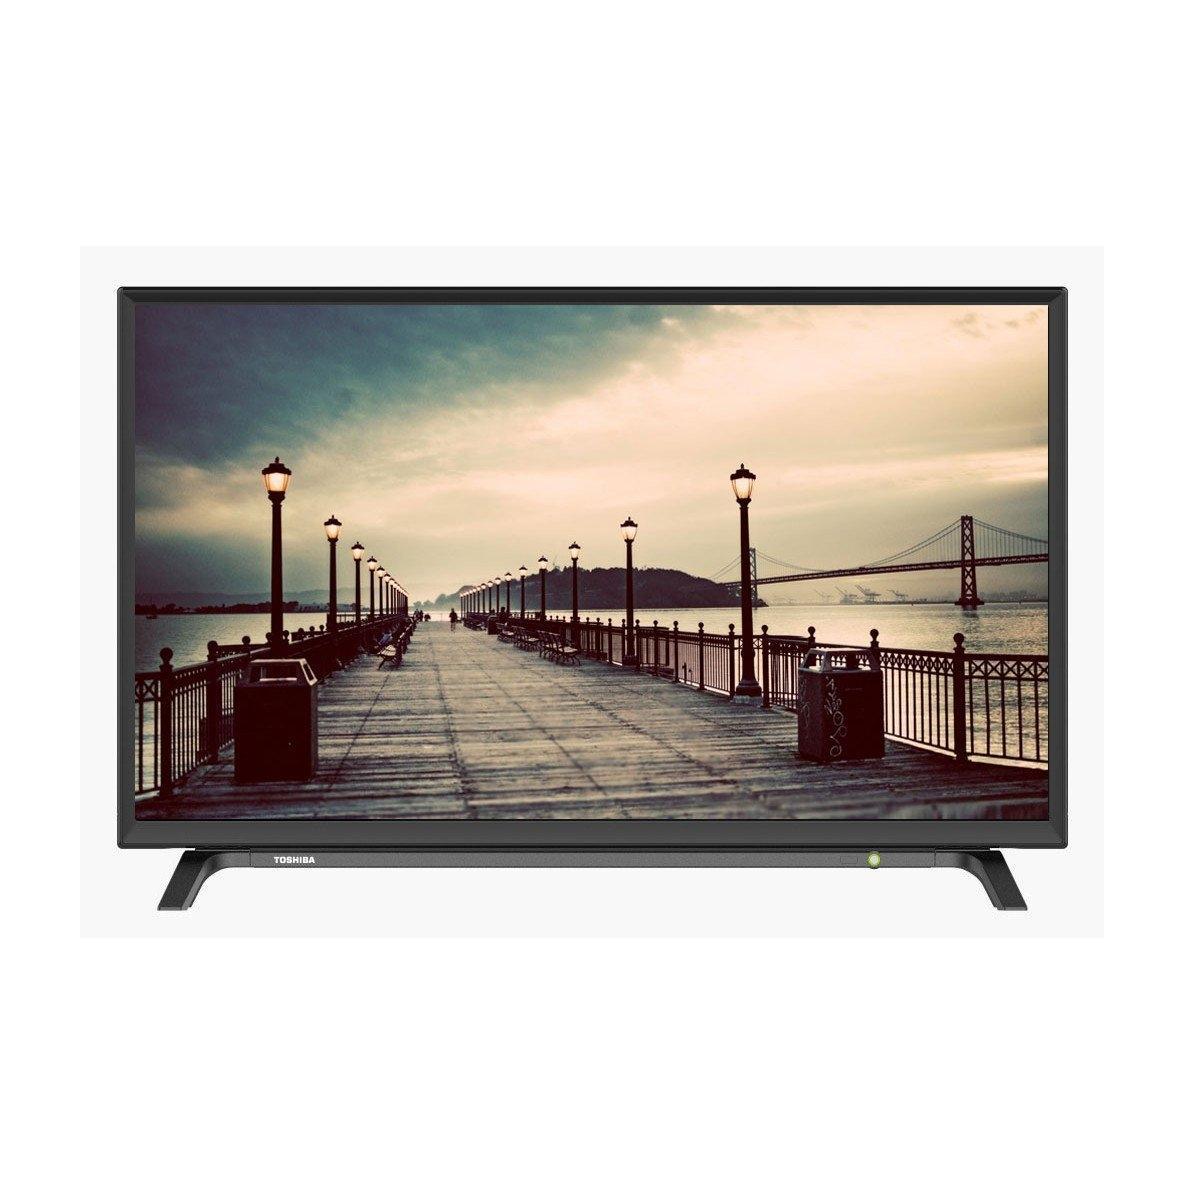 Toshiba LED TV 32 32L1600 Hitam - Khusus Jadetabek